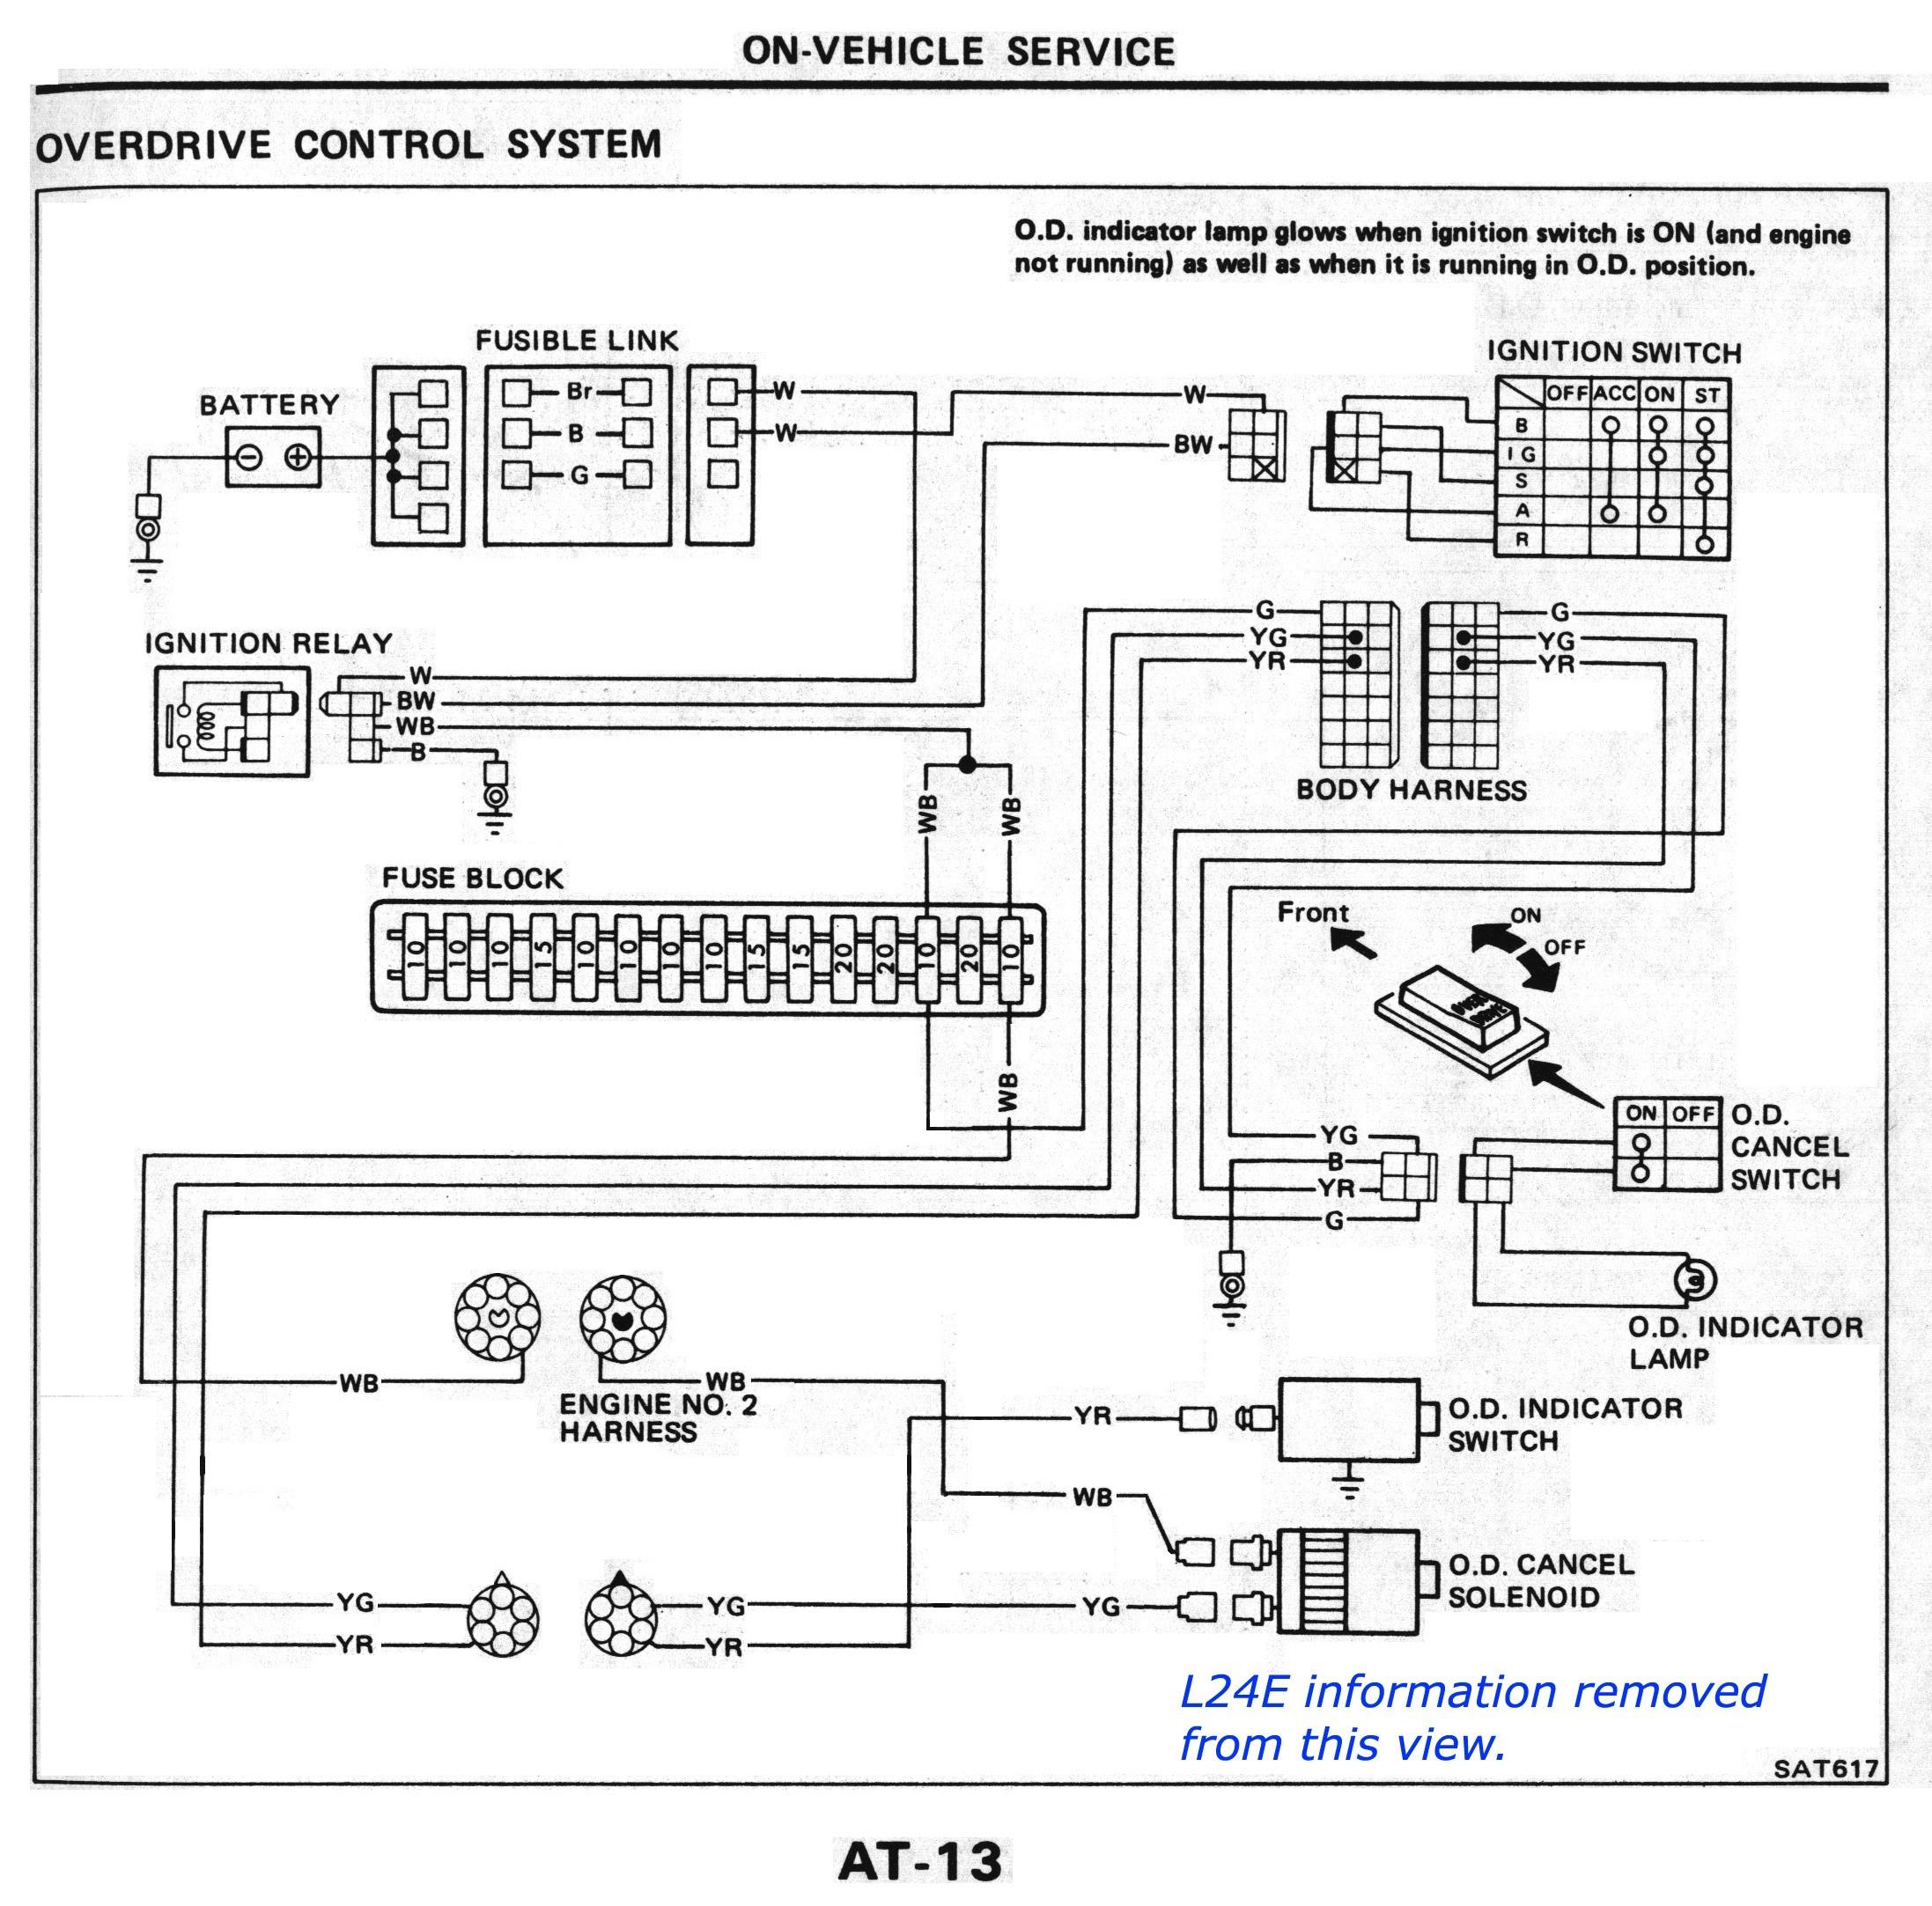 Nissan Sentra Engine Diagram Nissandiesel forums • View topic L4n71b Od at 1983 84 Of Nissan Sentra Engine Diagram